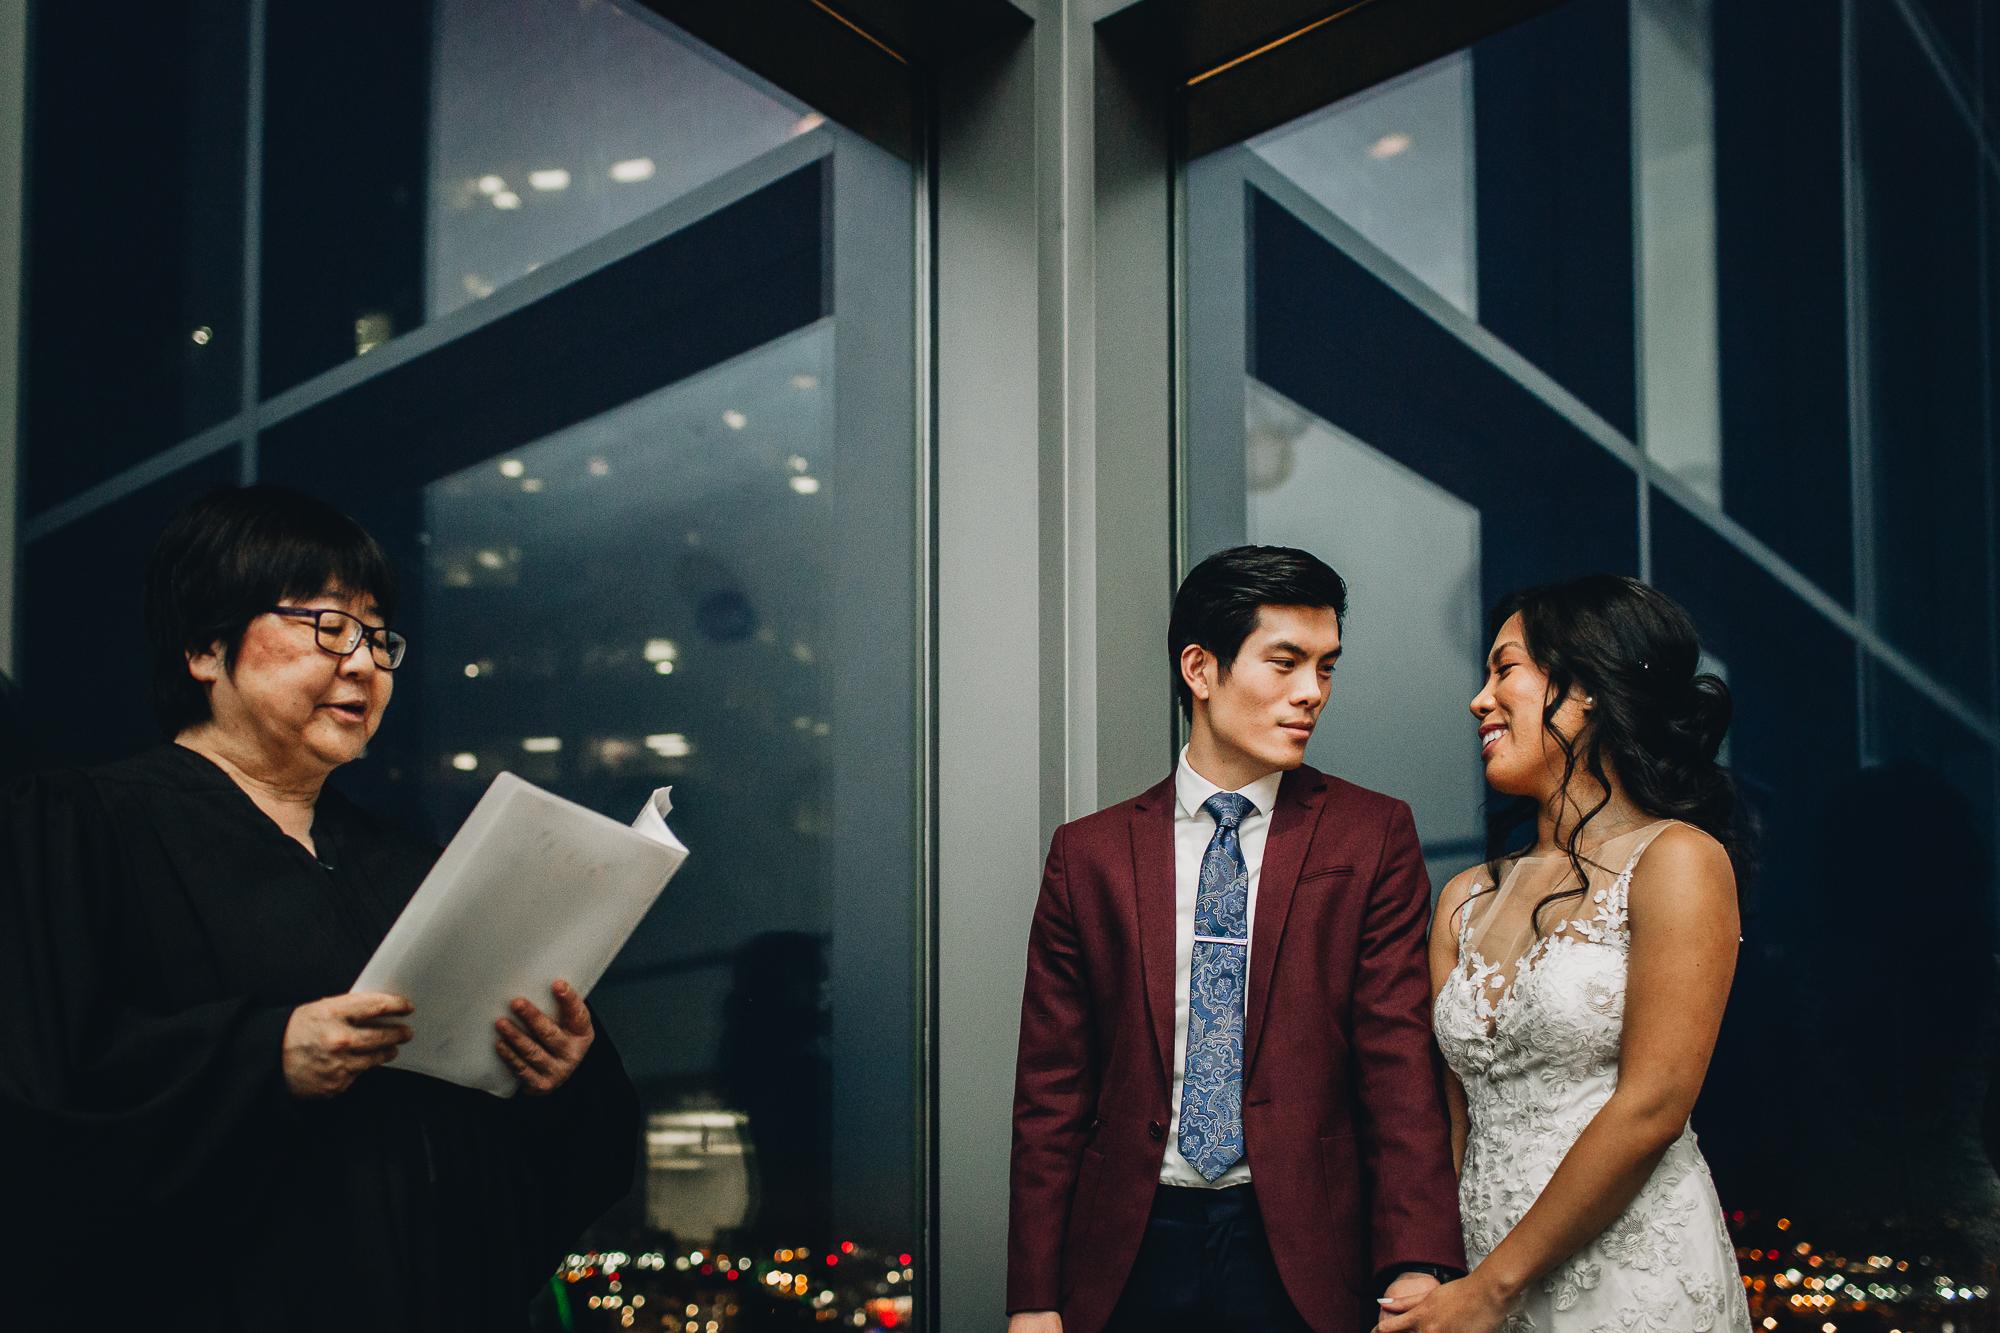 Seattle courthouse wedding photos kristawelch58.jpg